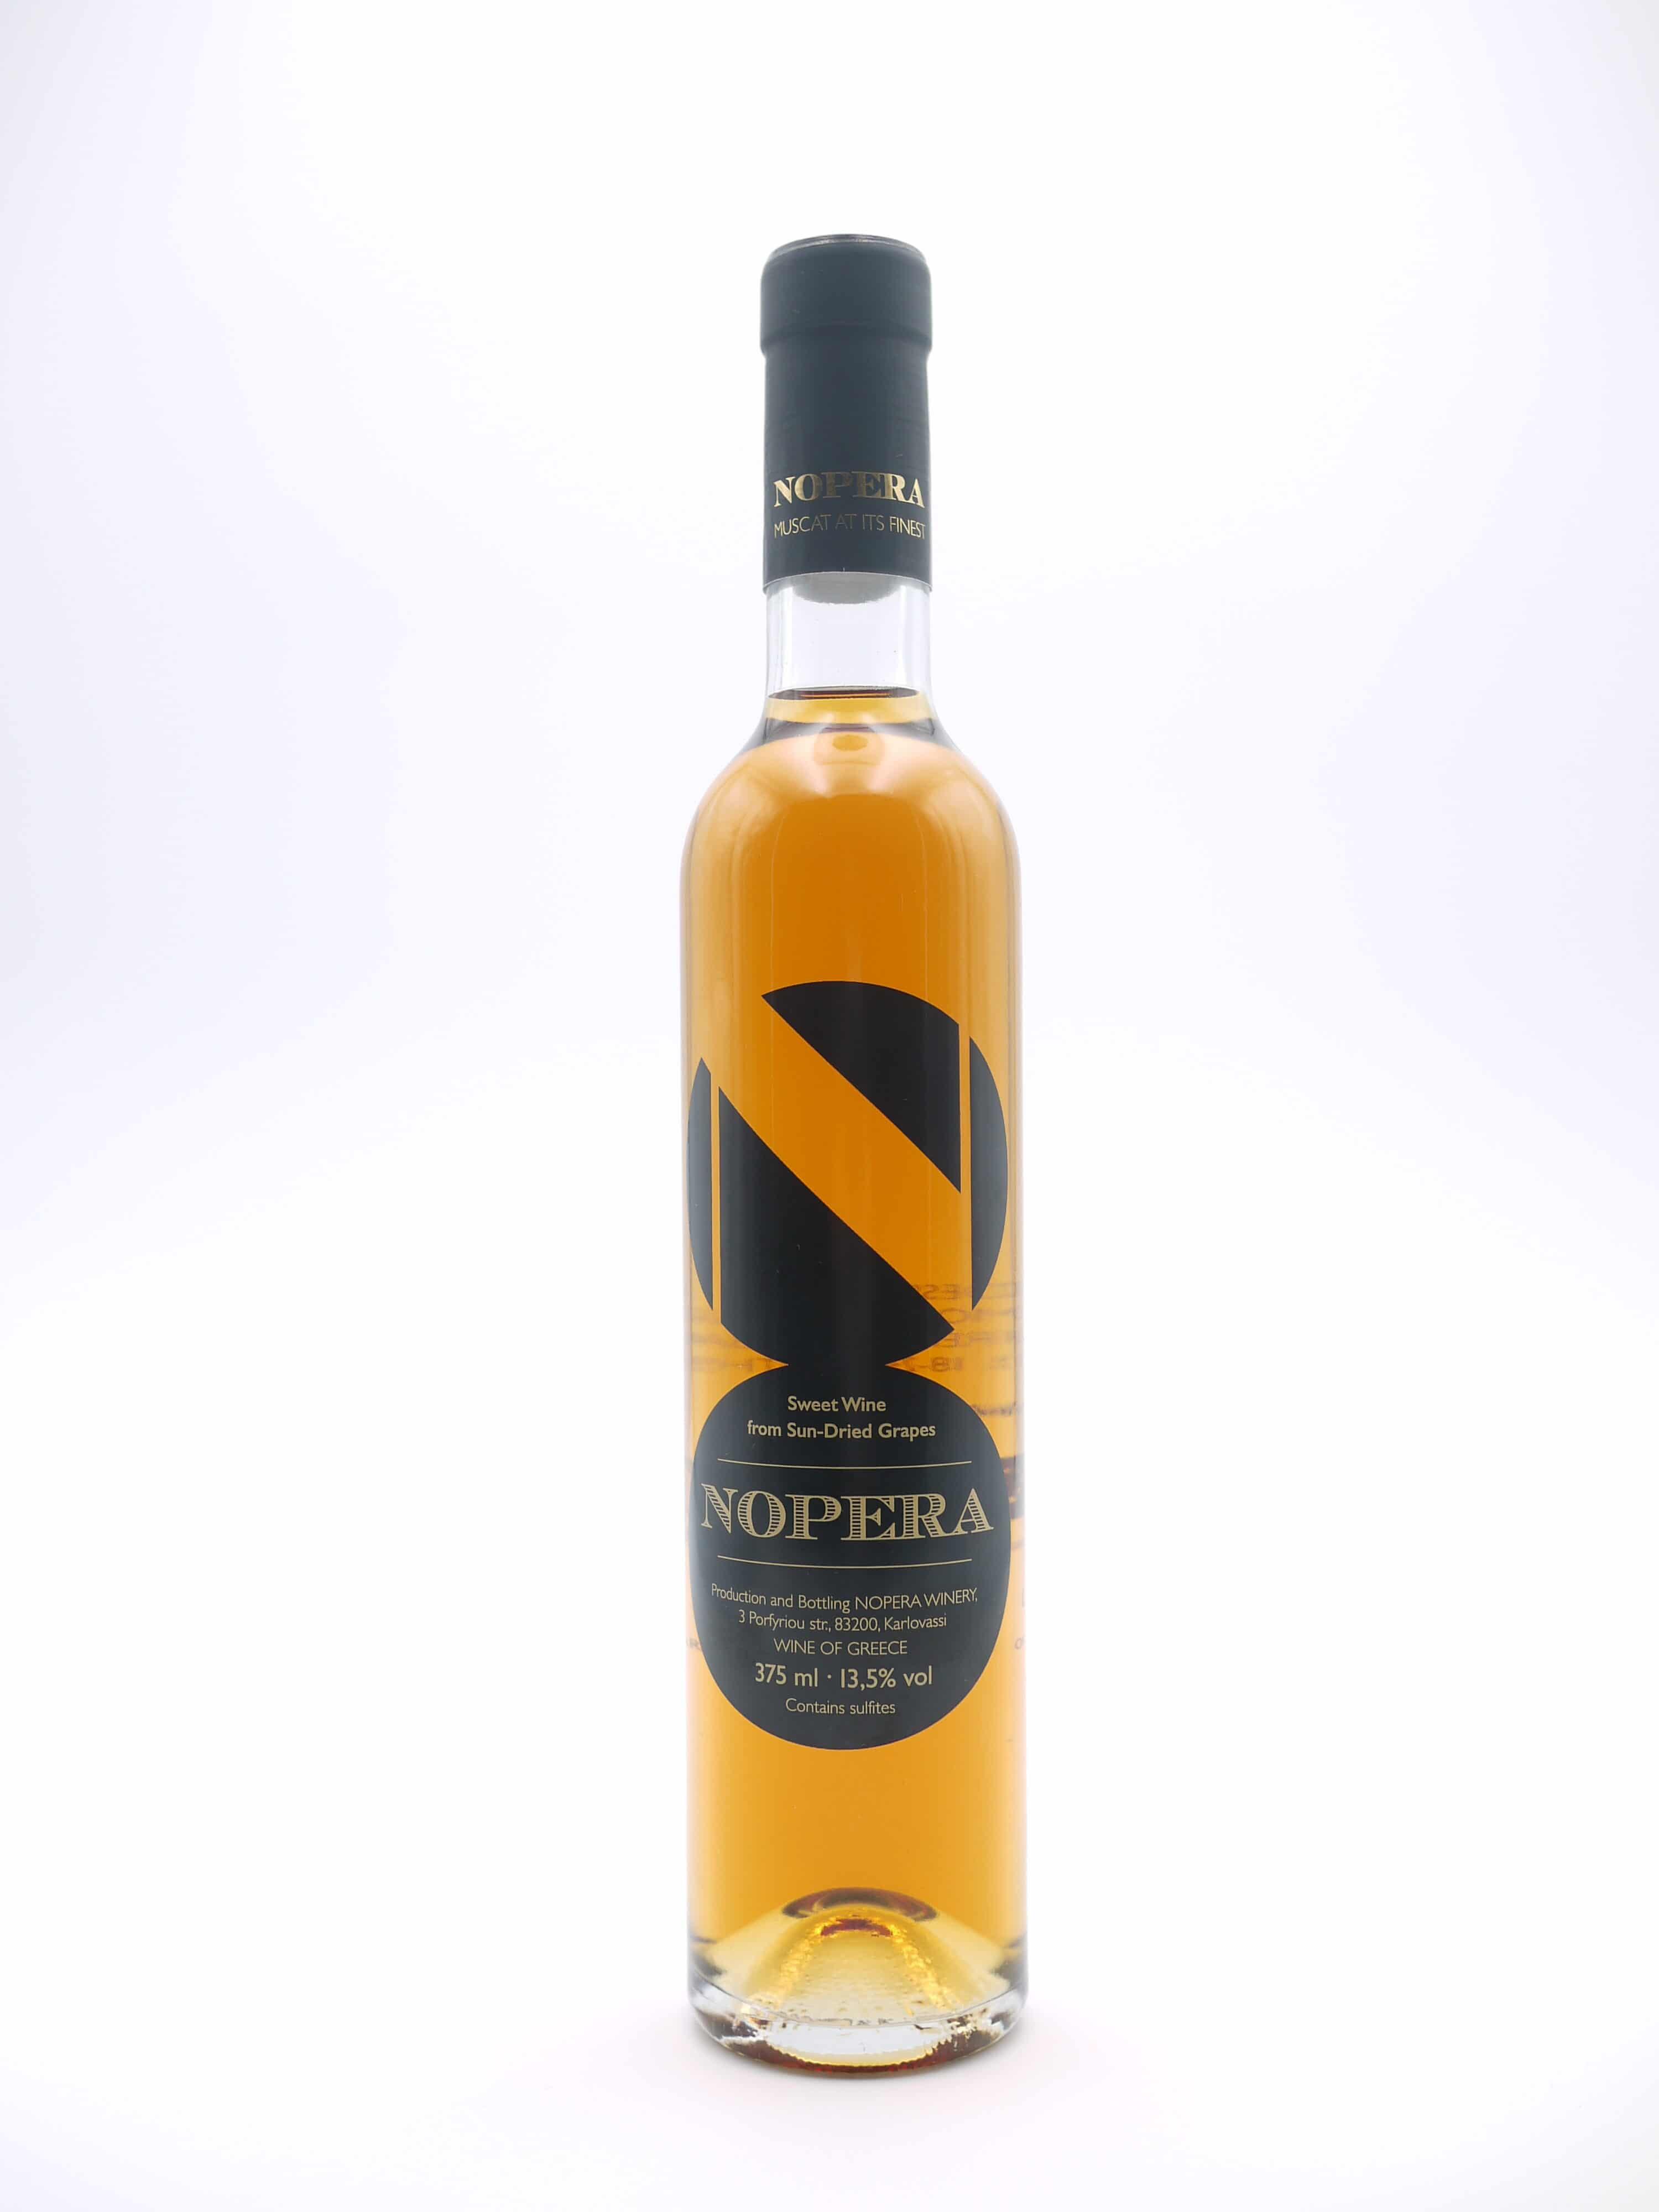 Nopera Sweet Wine